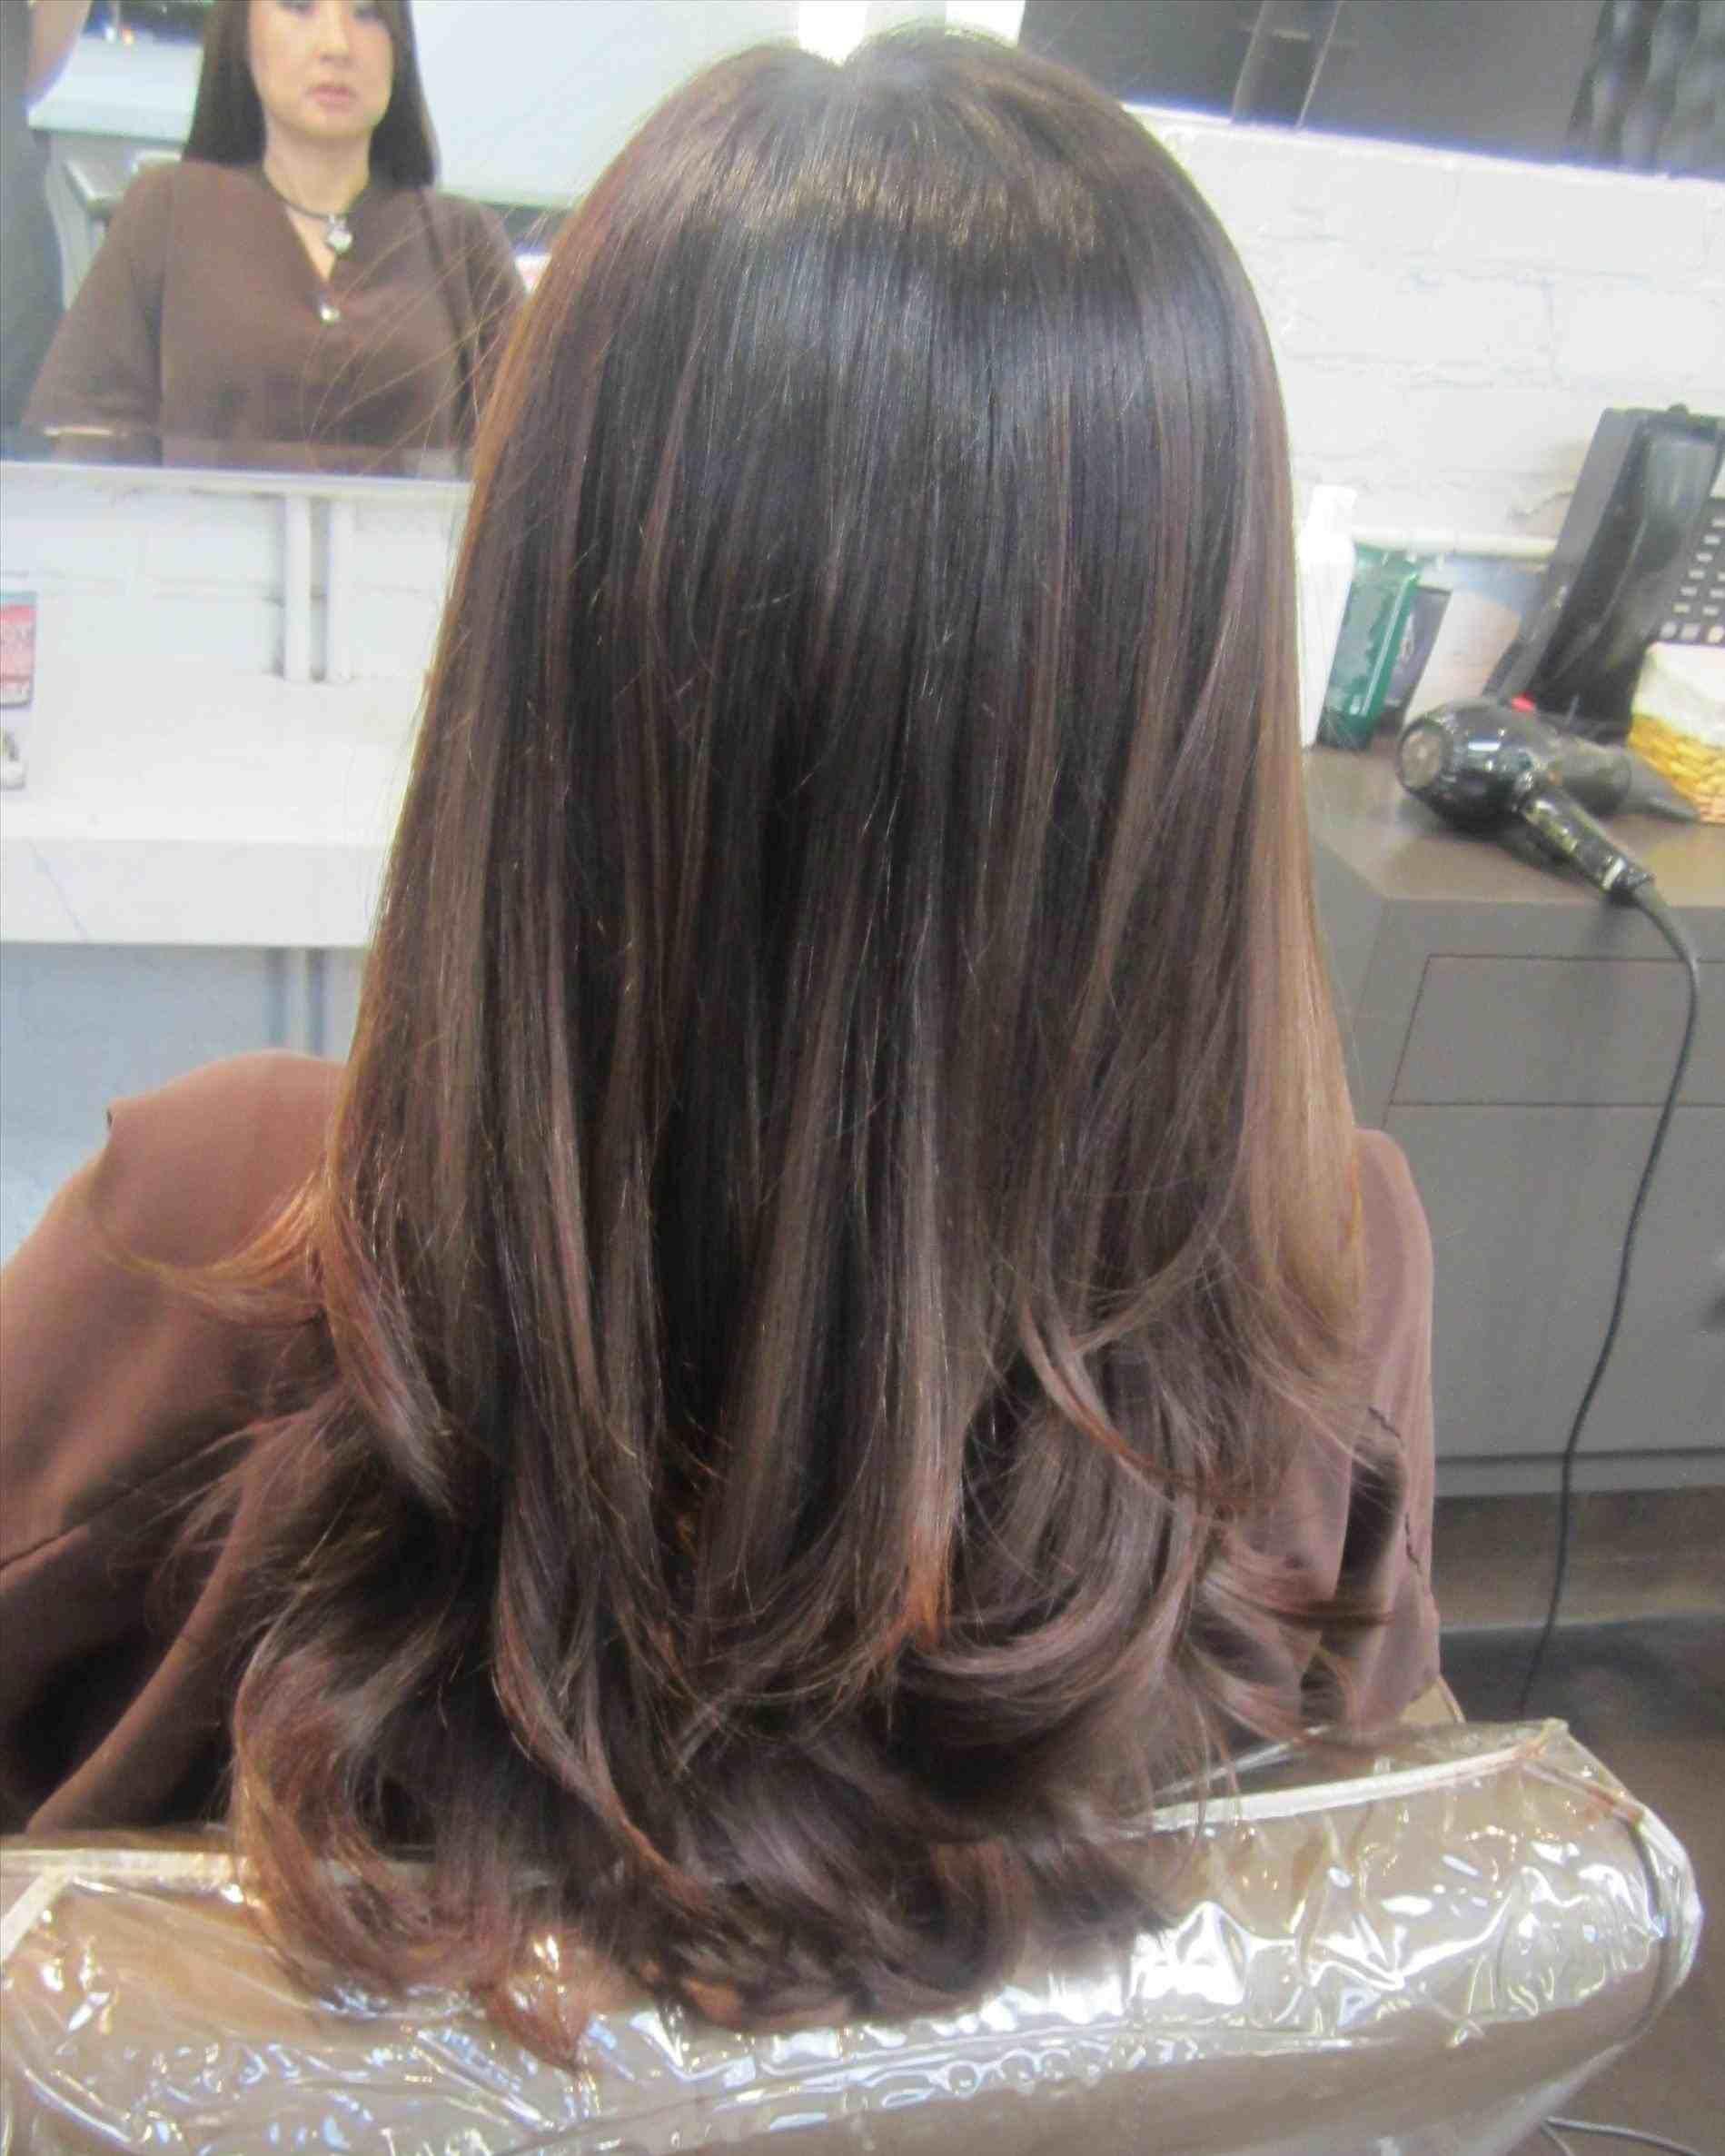 Ash Brown Hair Color For Men Men Hair Color Brown Hair Hair Color For Women